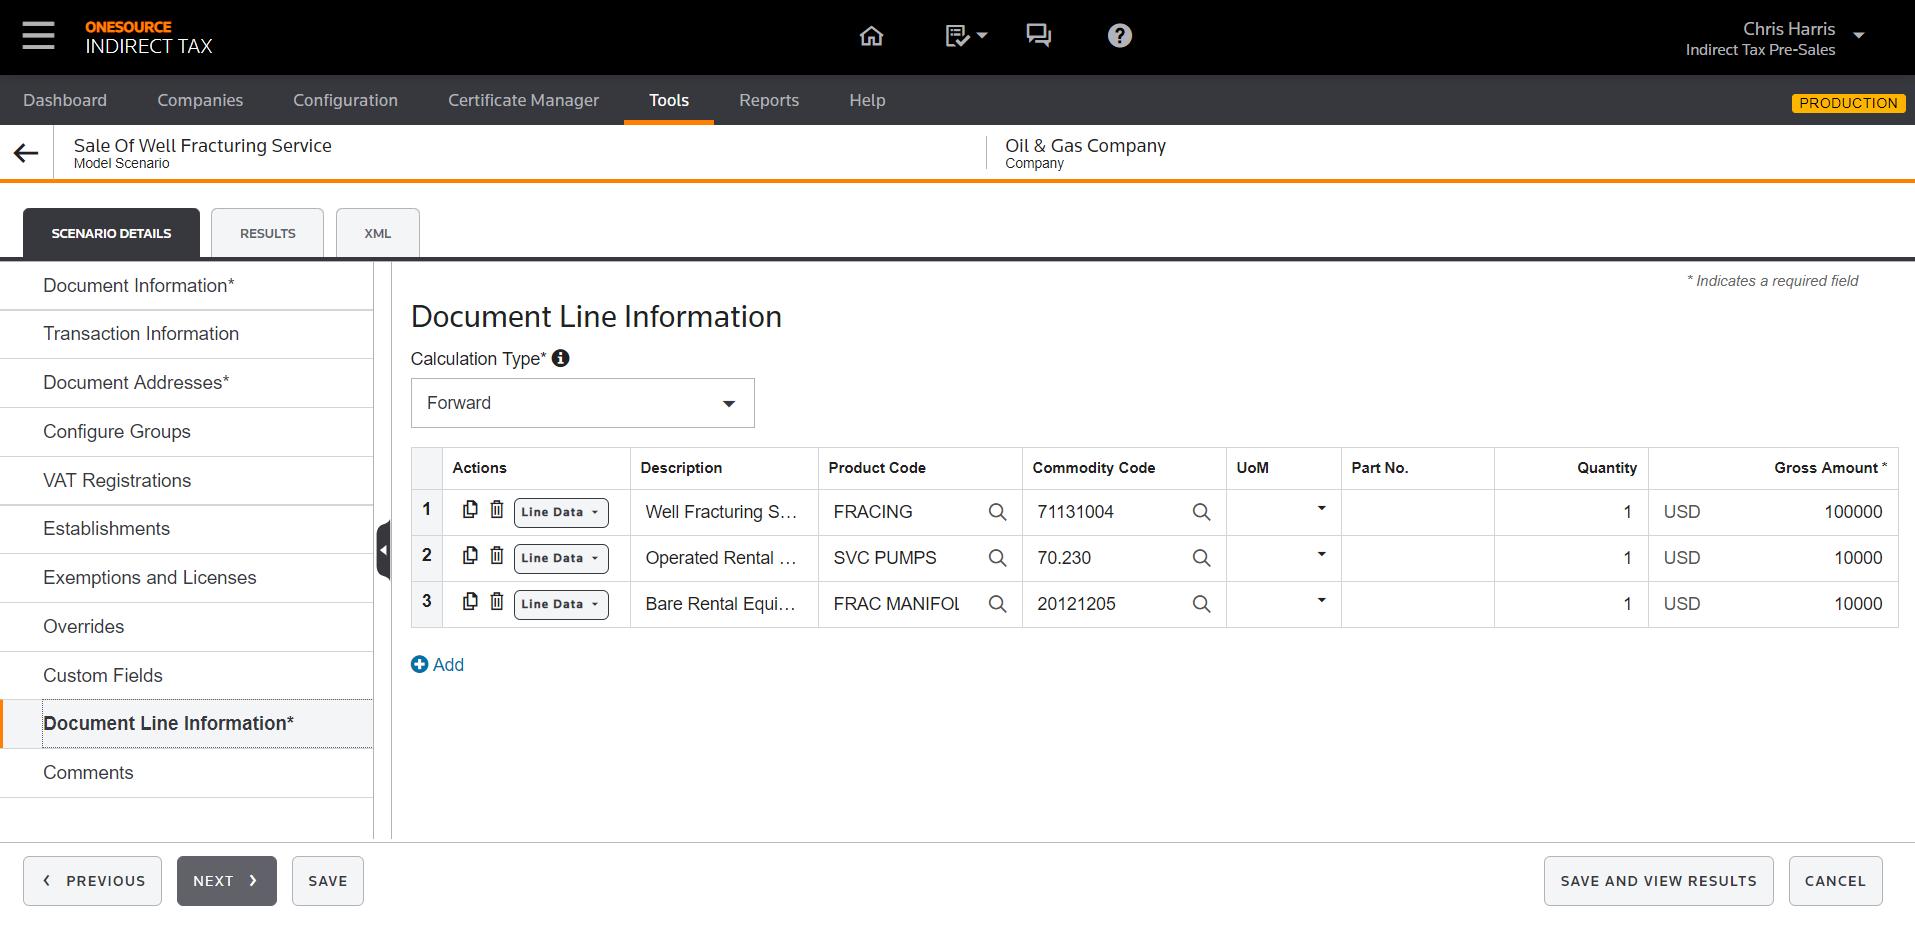 Document Line Information